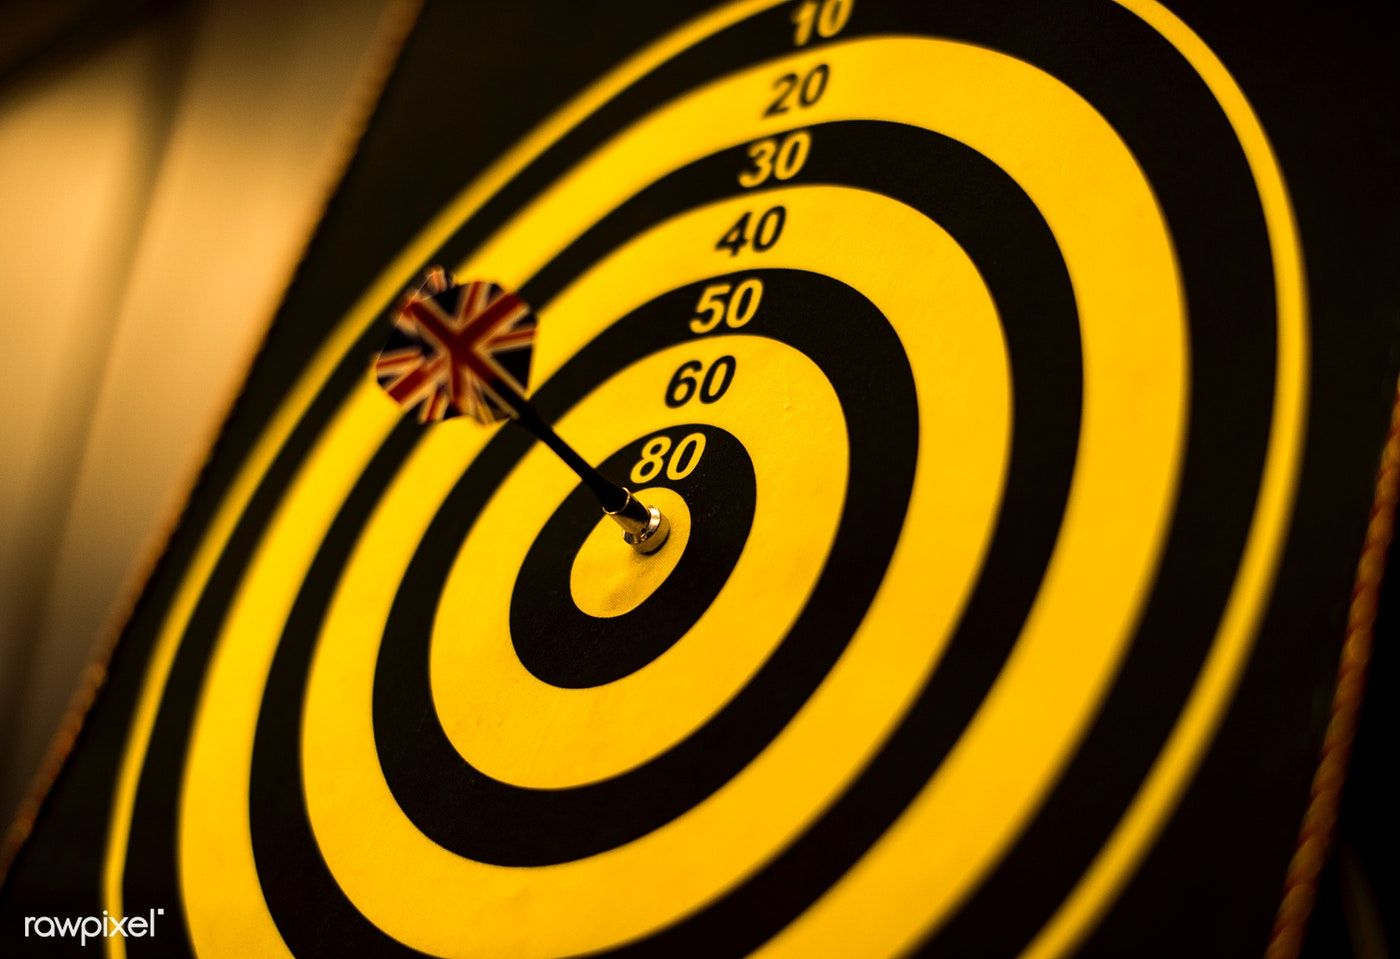 Bullseye Score On A Dartboard Free Image By Rawpixel Com Teddy Rawpixel